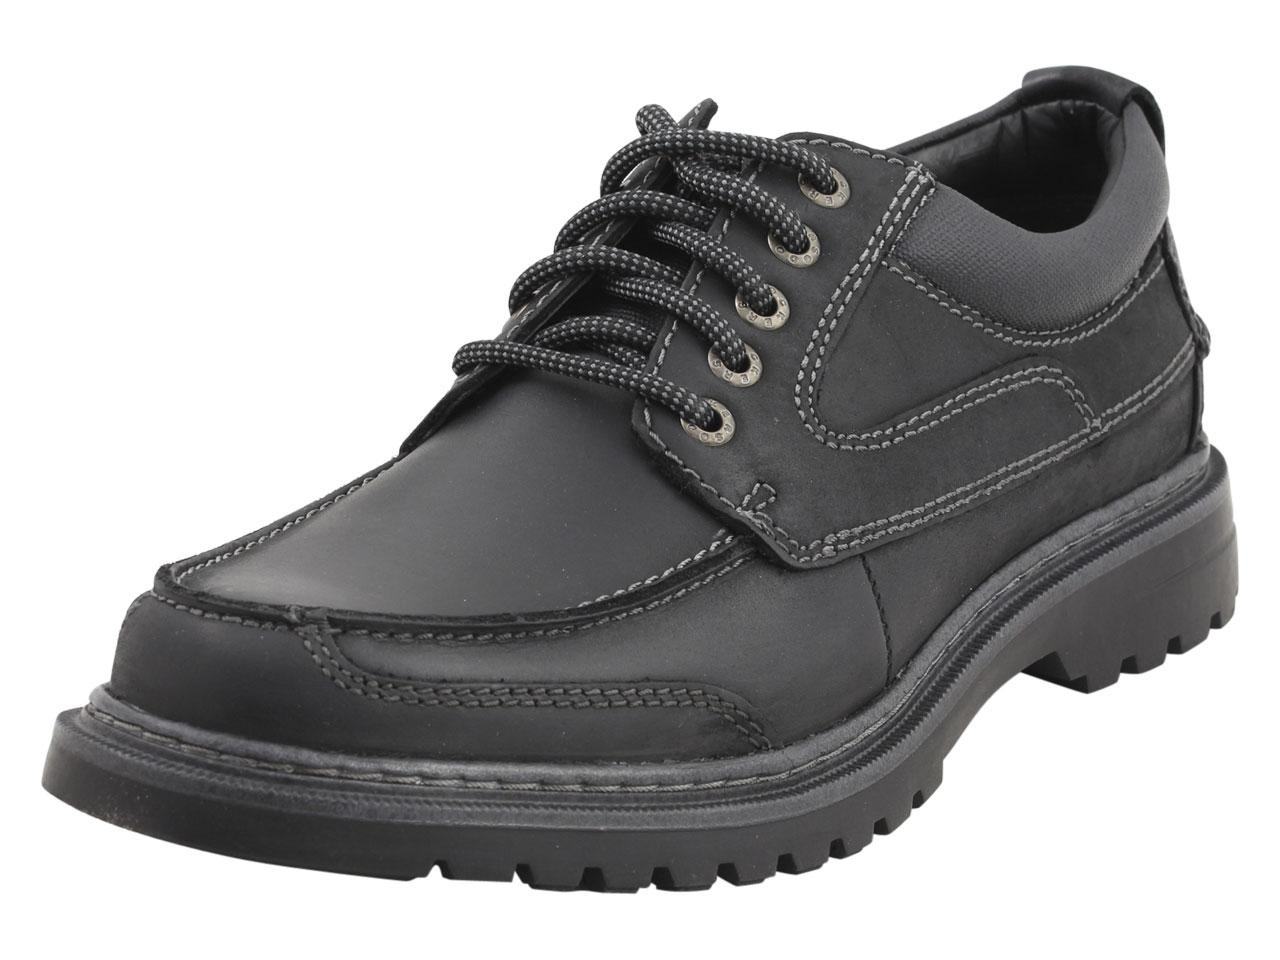 Image of Dockers Men's Overton Water Repellent Oxfords Shoes - Black - 8 D(M) US